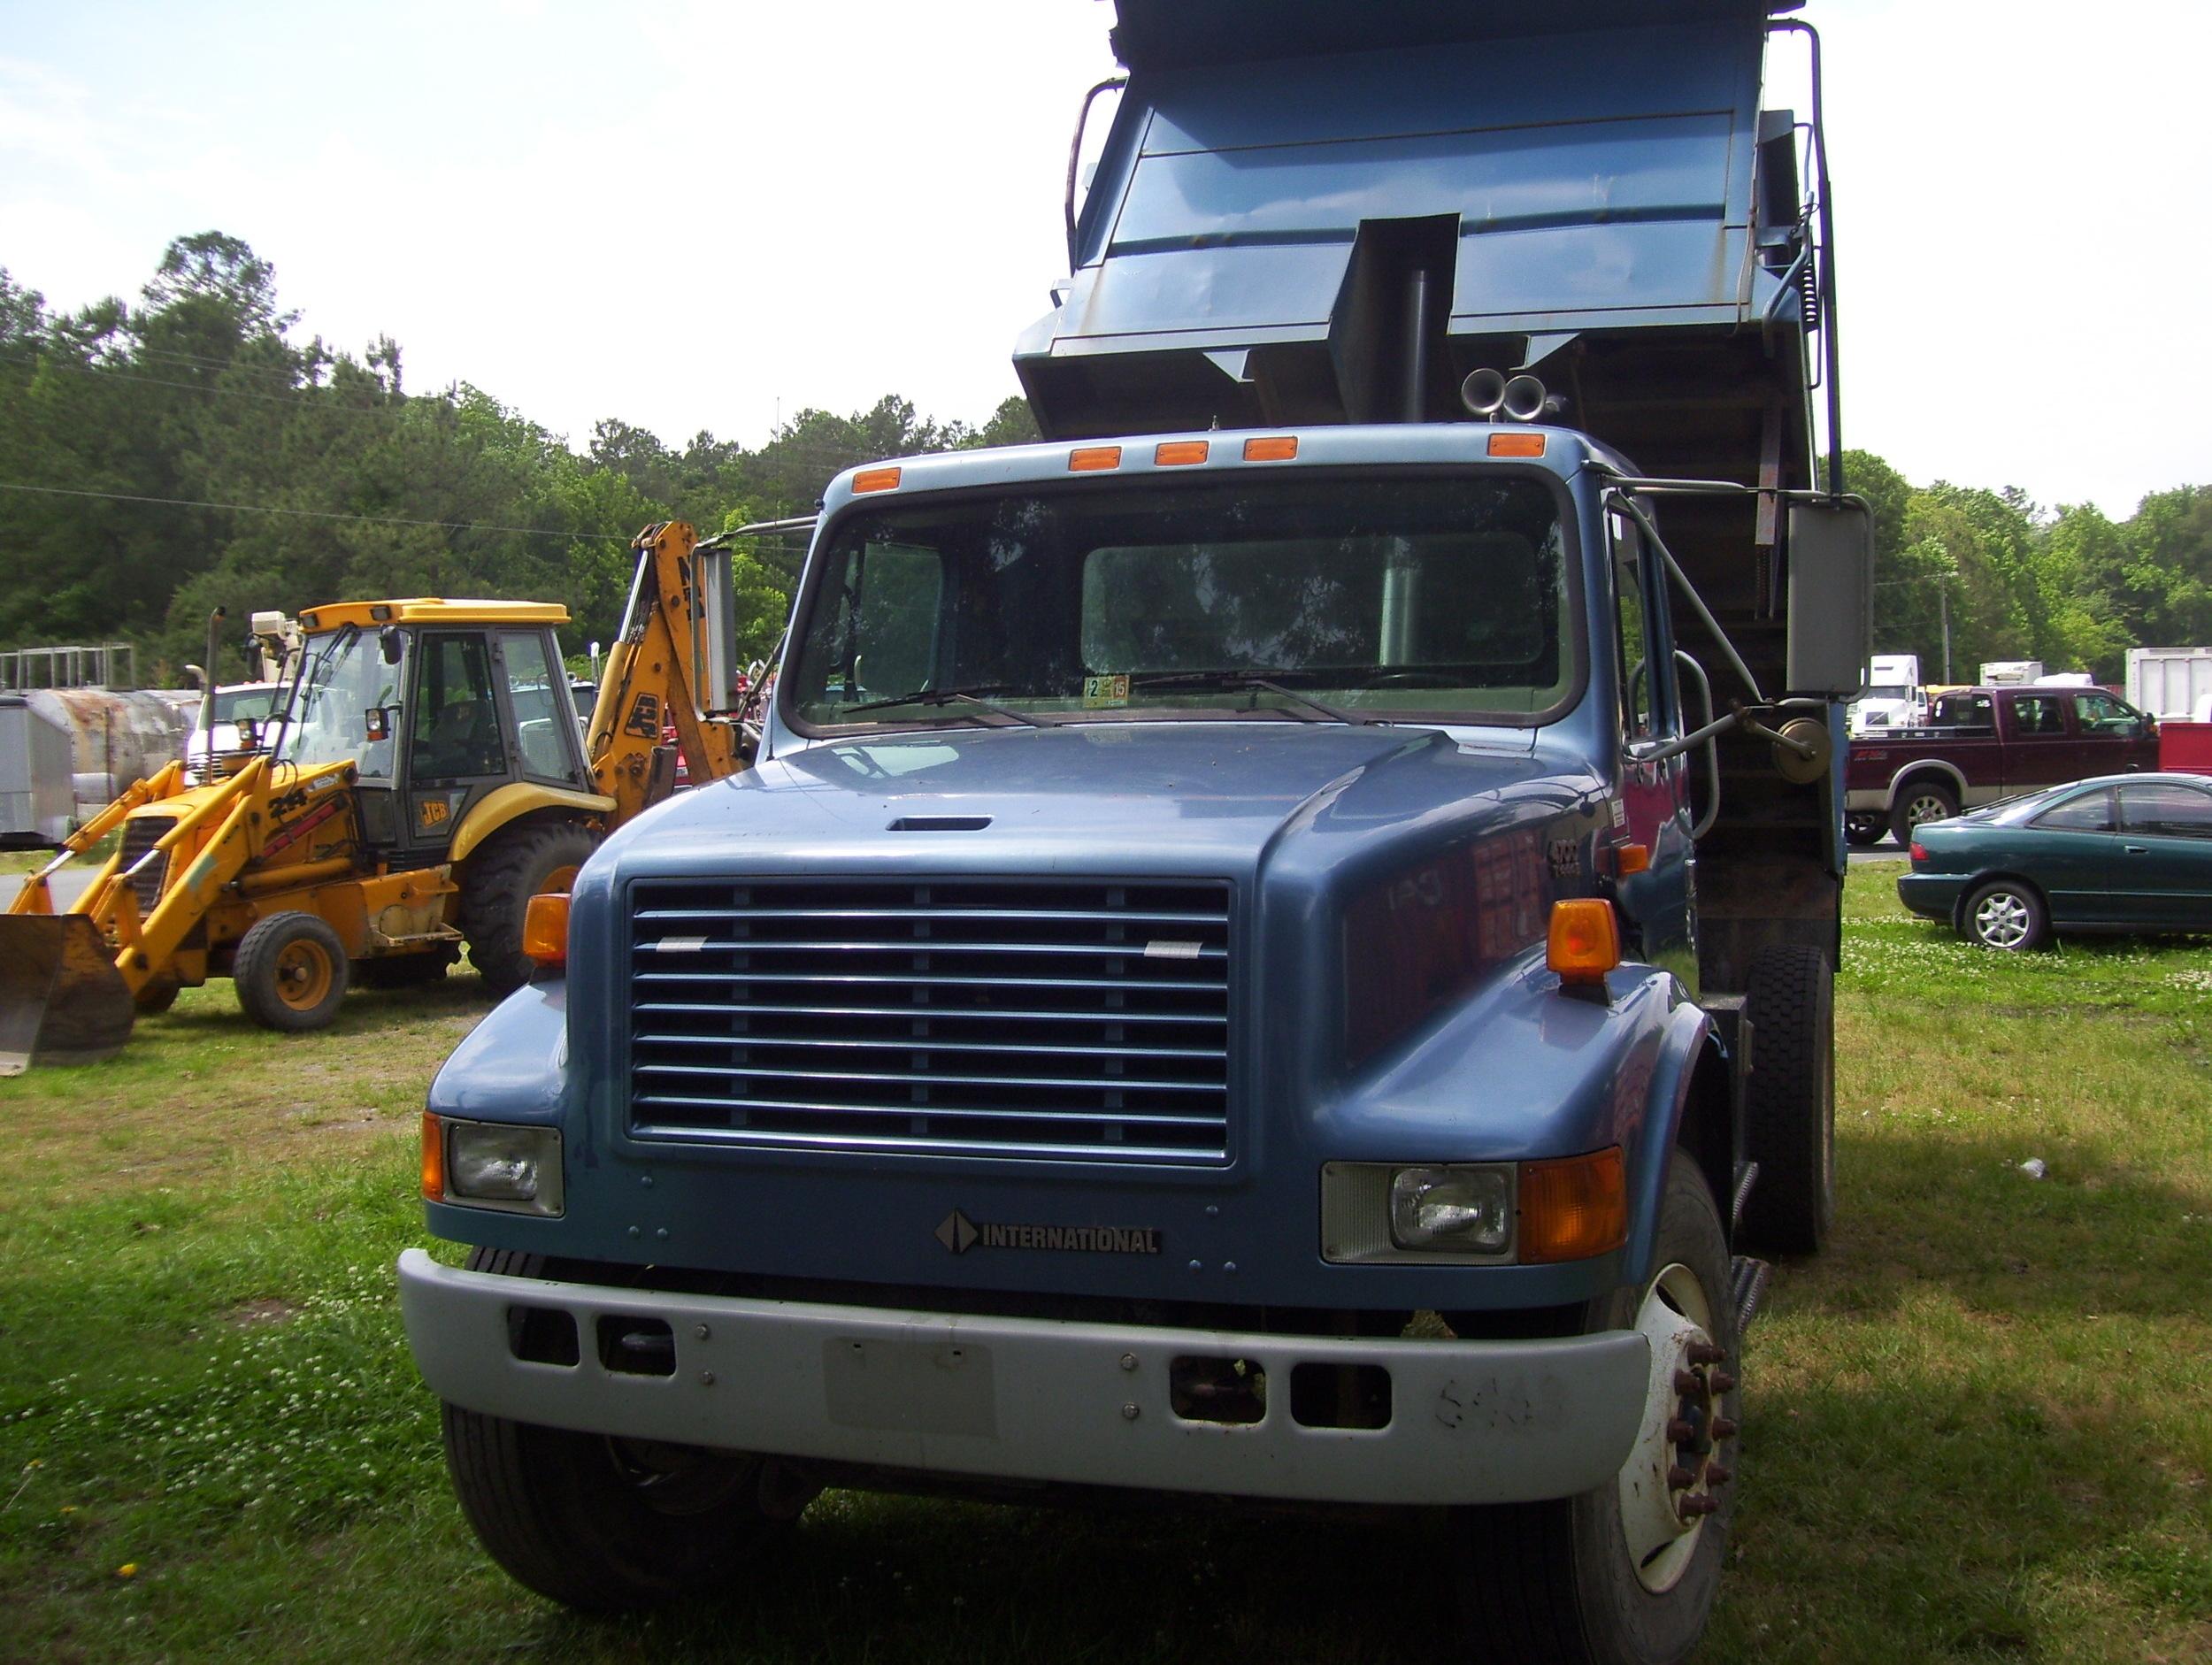 2002 International Dump Truck 004.jpg